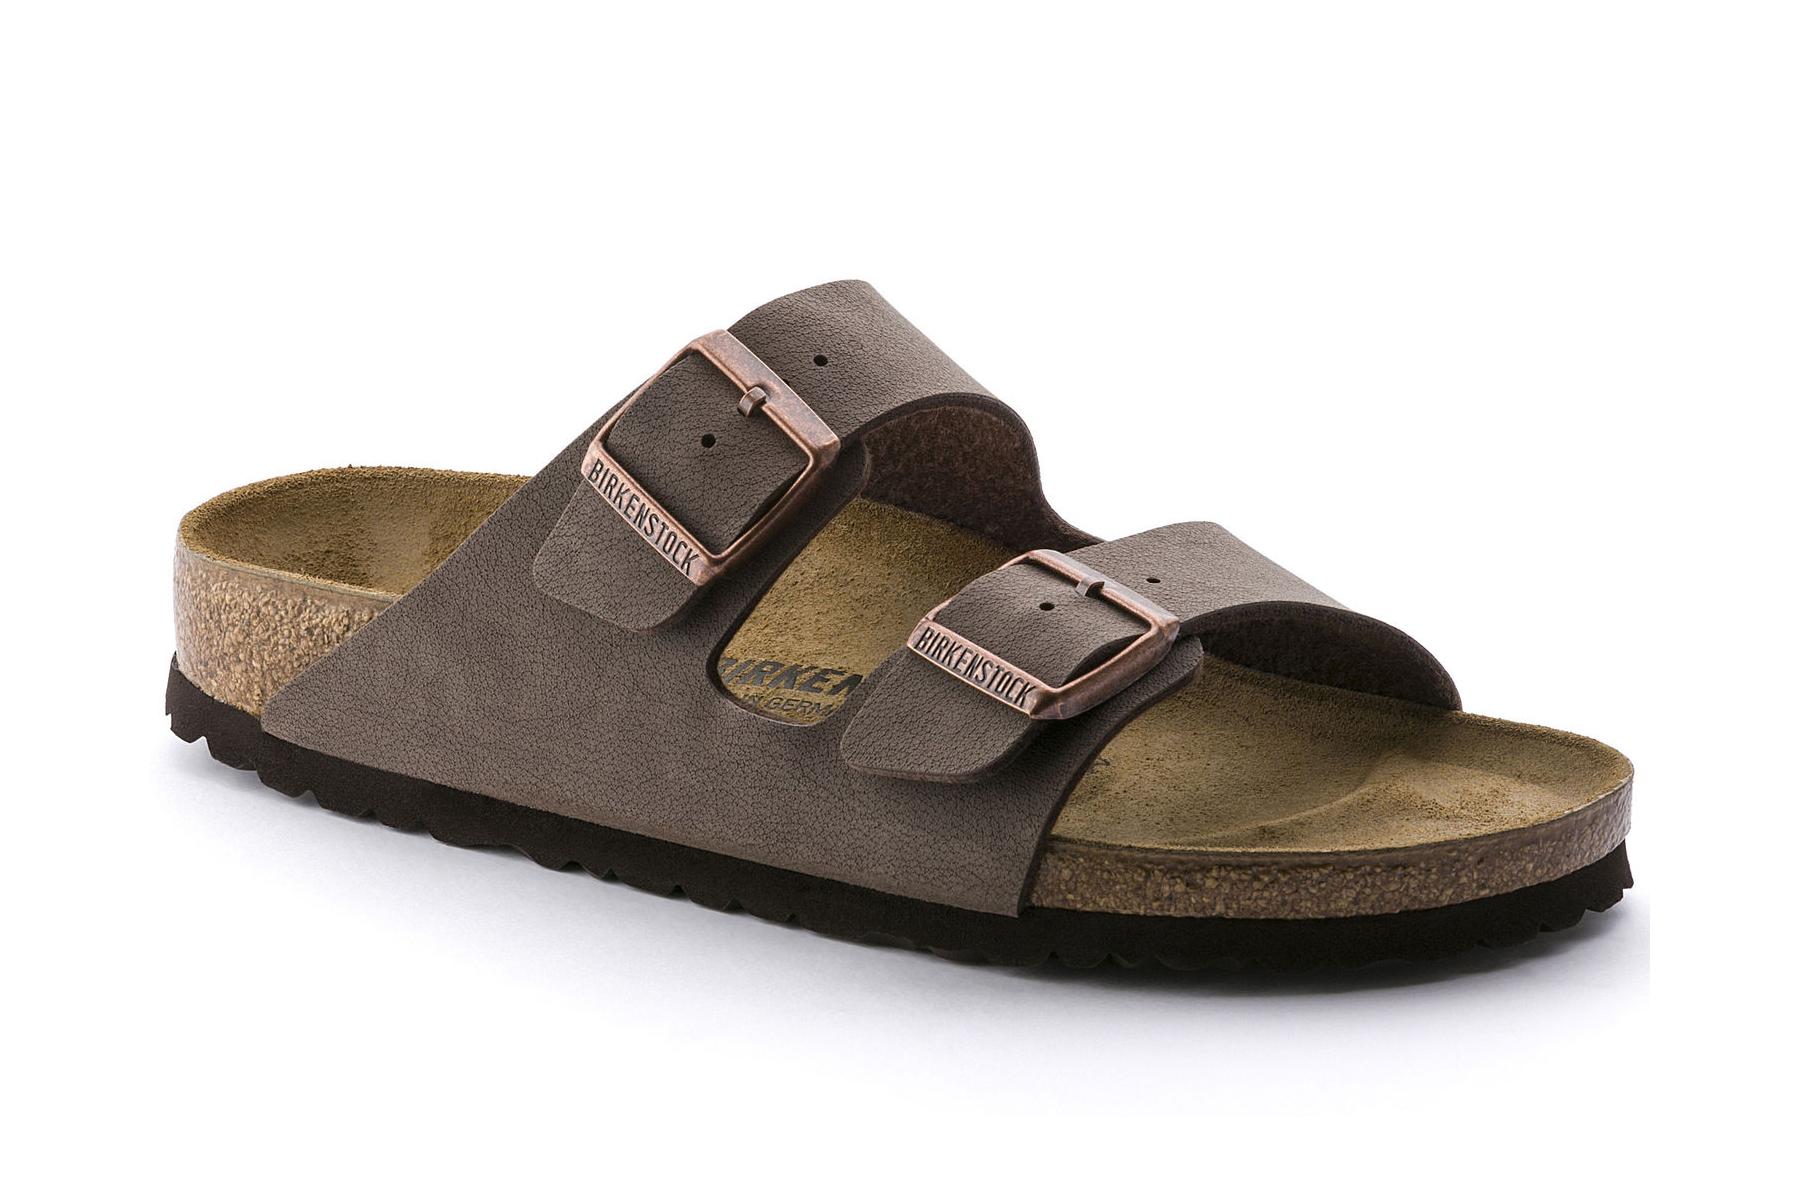 best orthotic sandals for plantar fasciitis